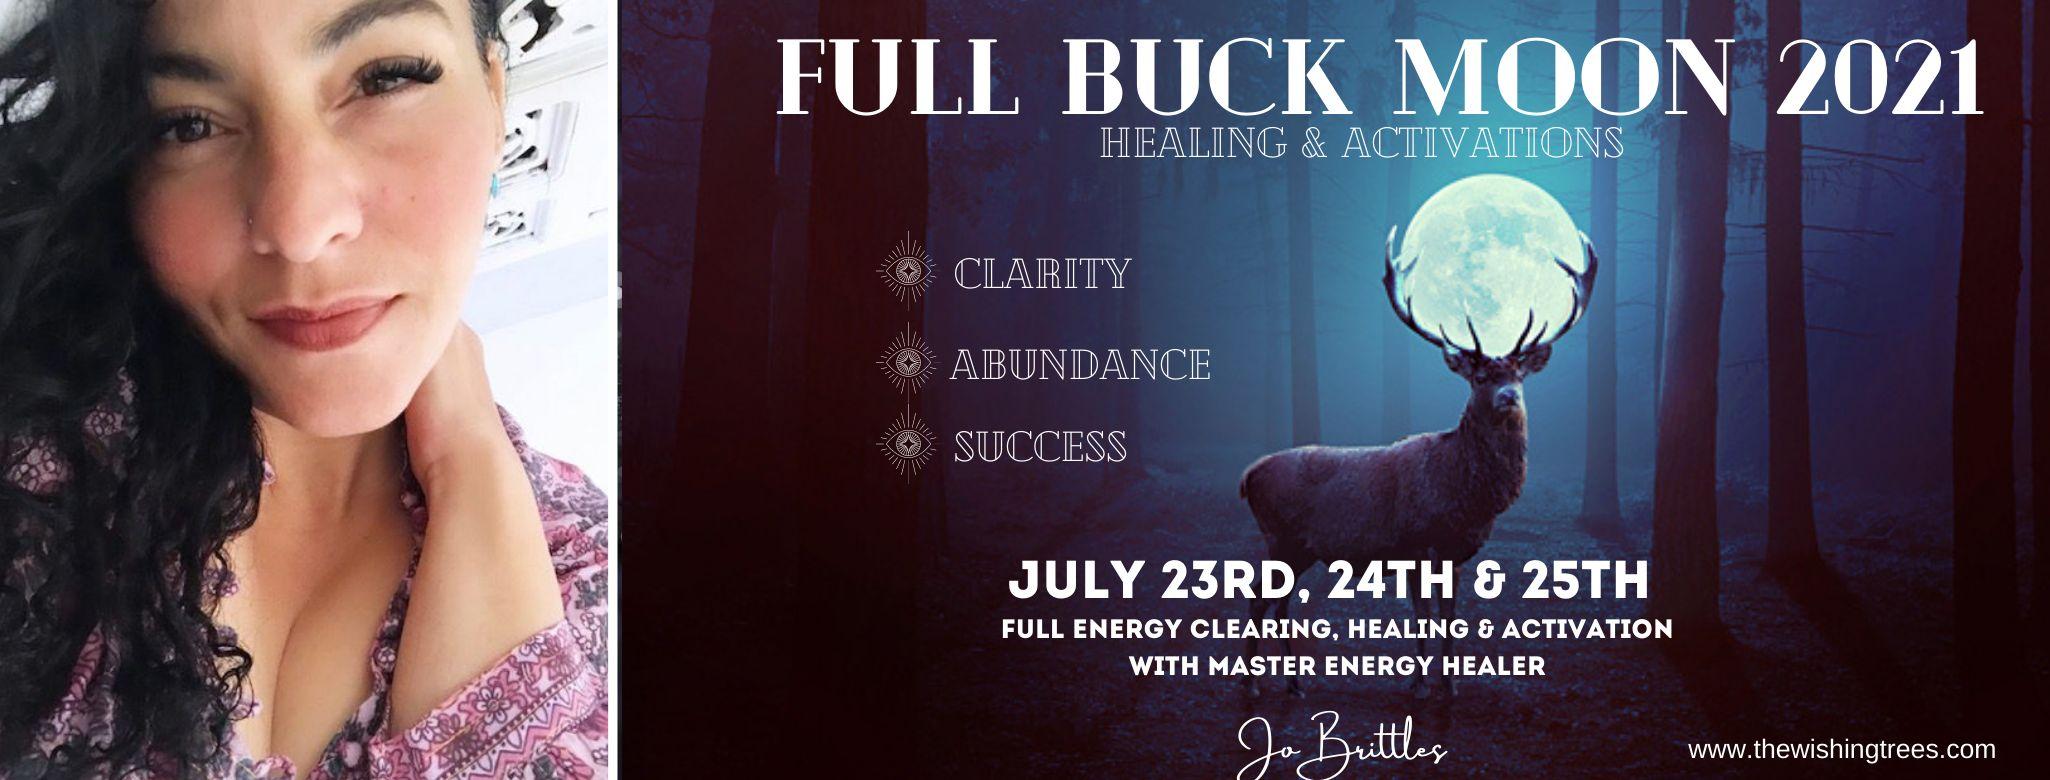 buck-moon-banner.jpg